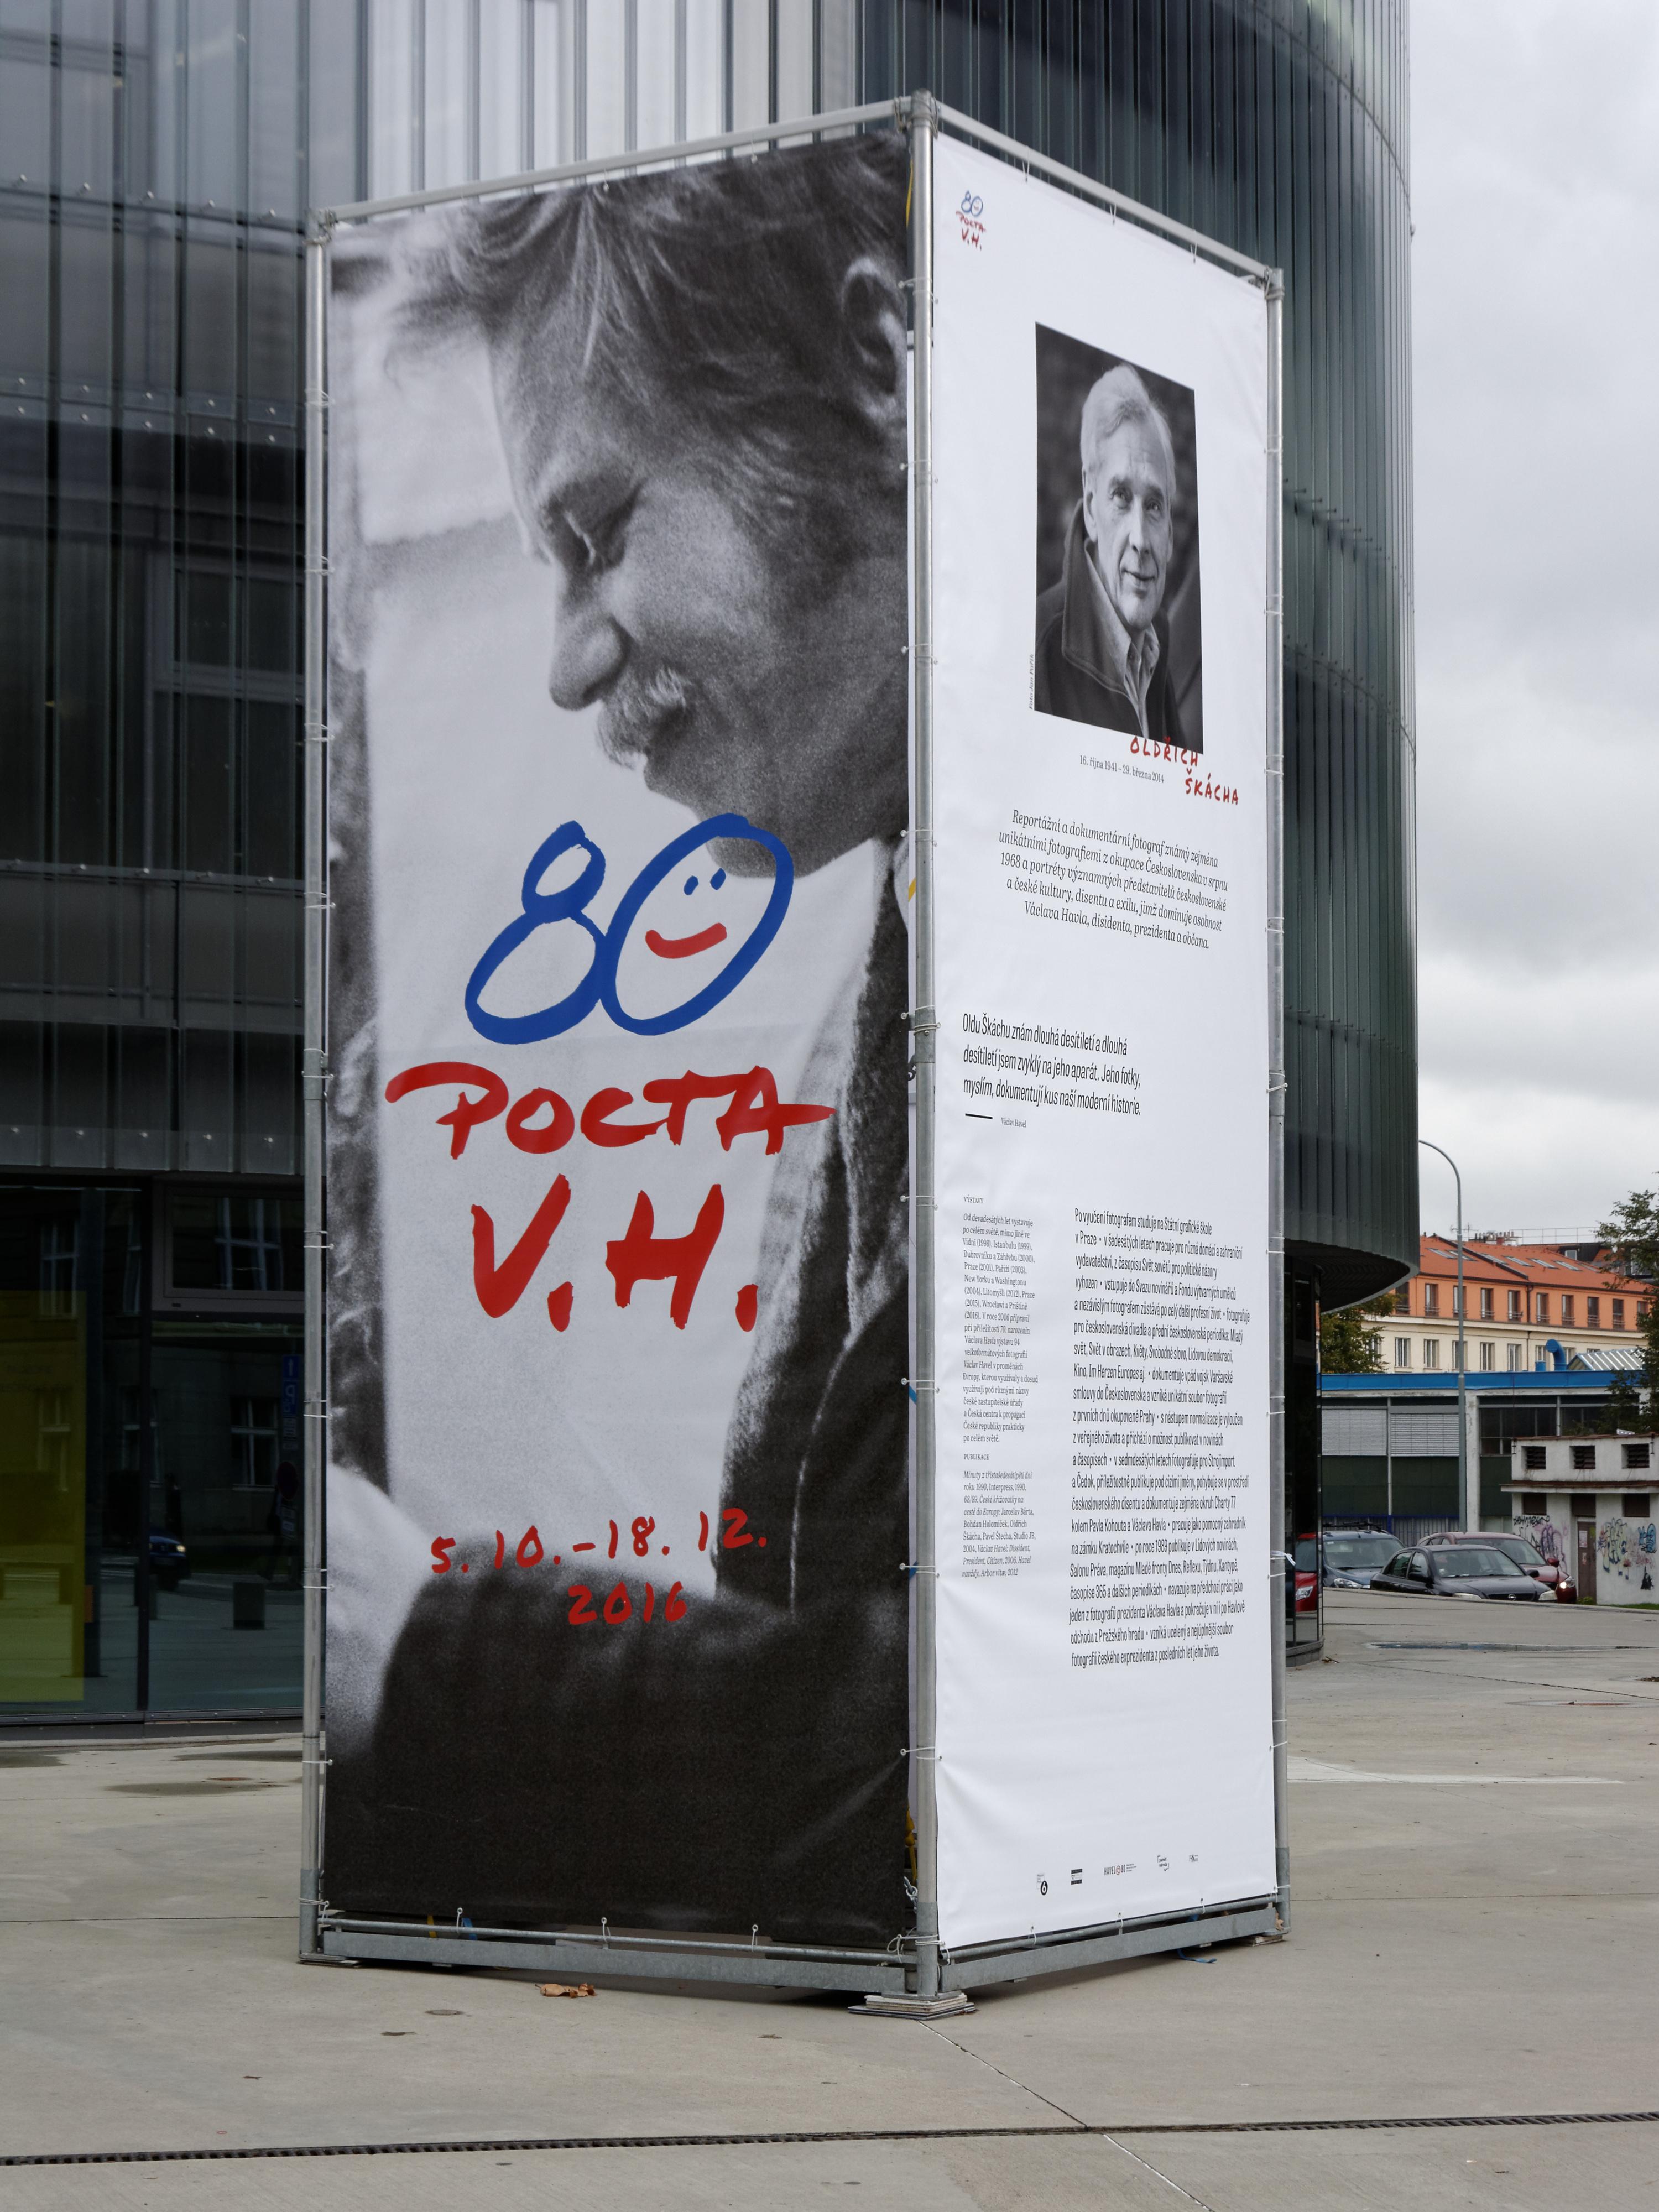 Exhibition 'Pocta V. H.' (2016)